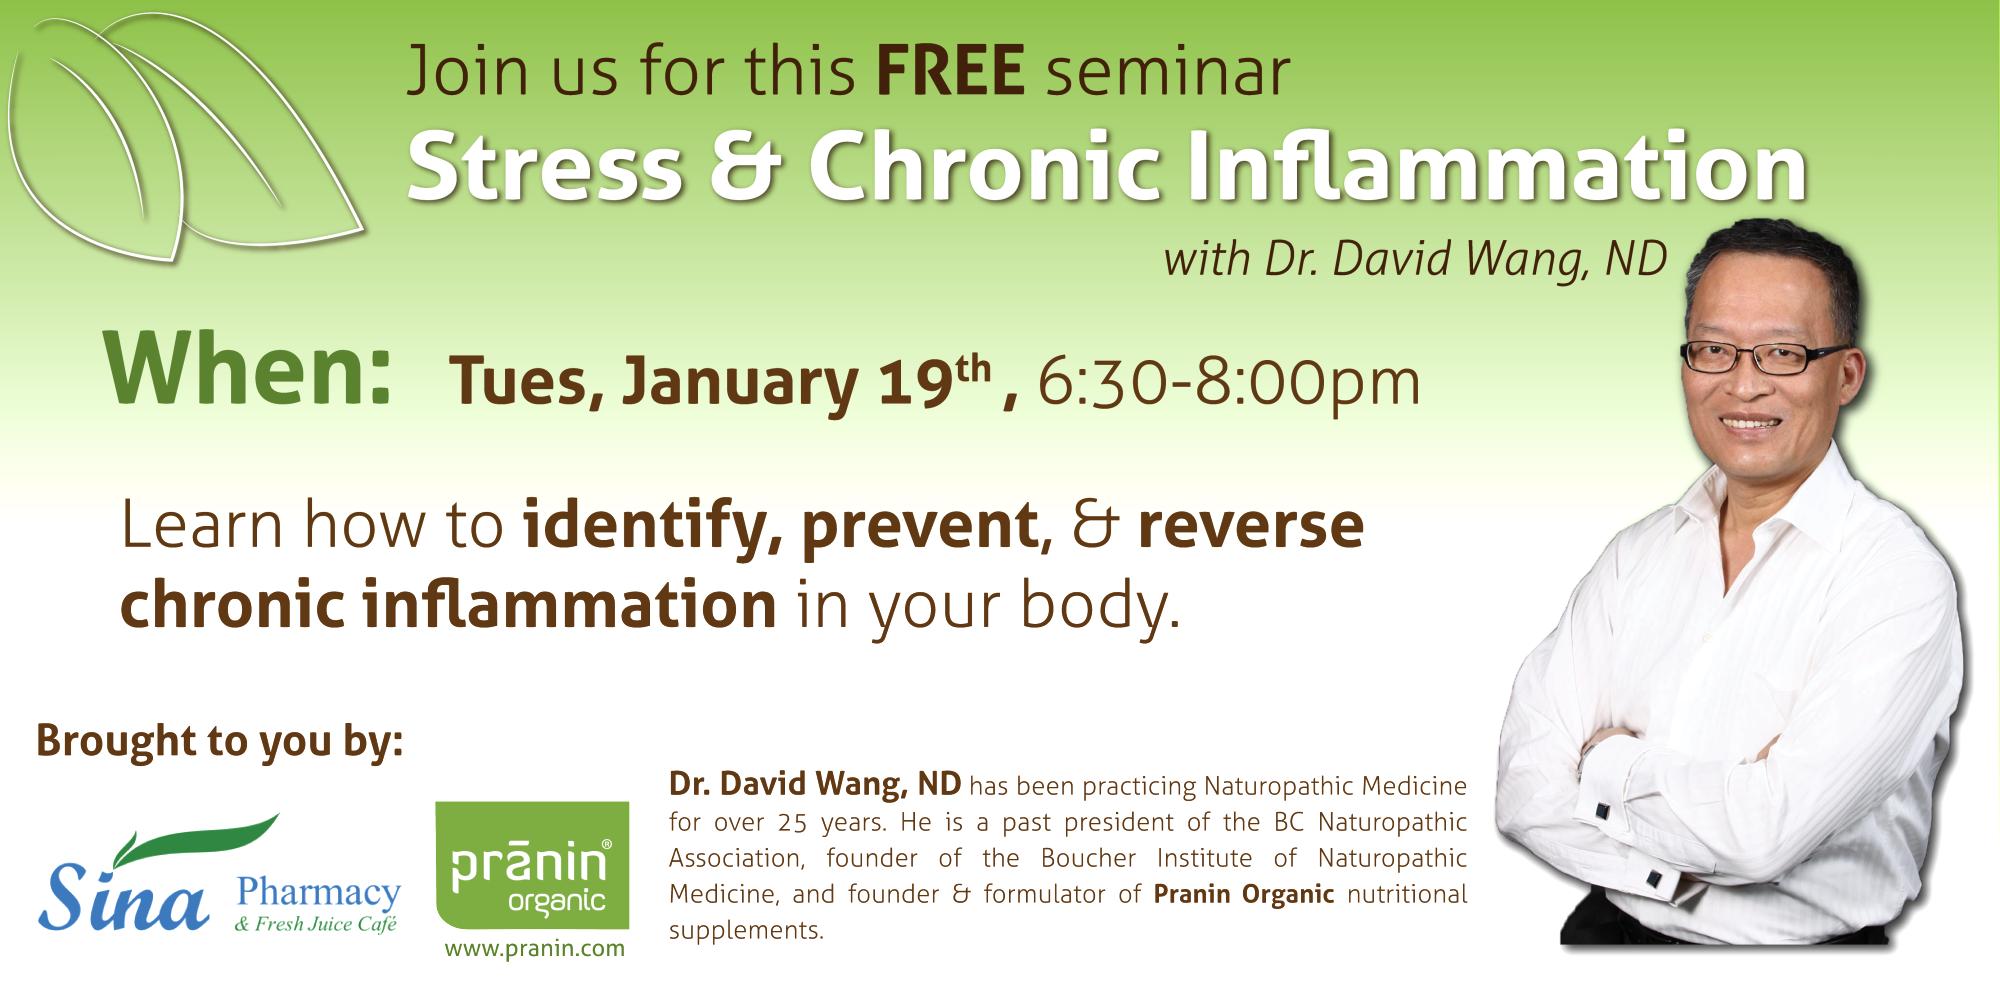 Sina Pharmacy - Stress & Chronic Inflammation Event